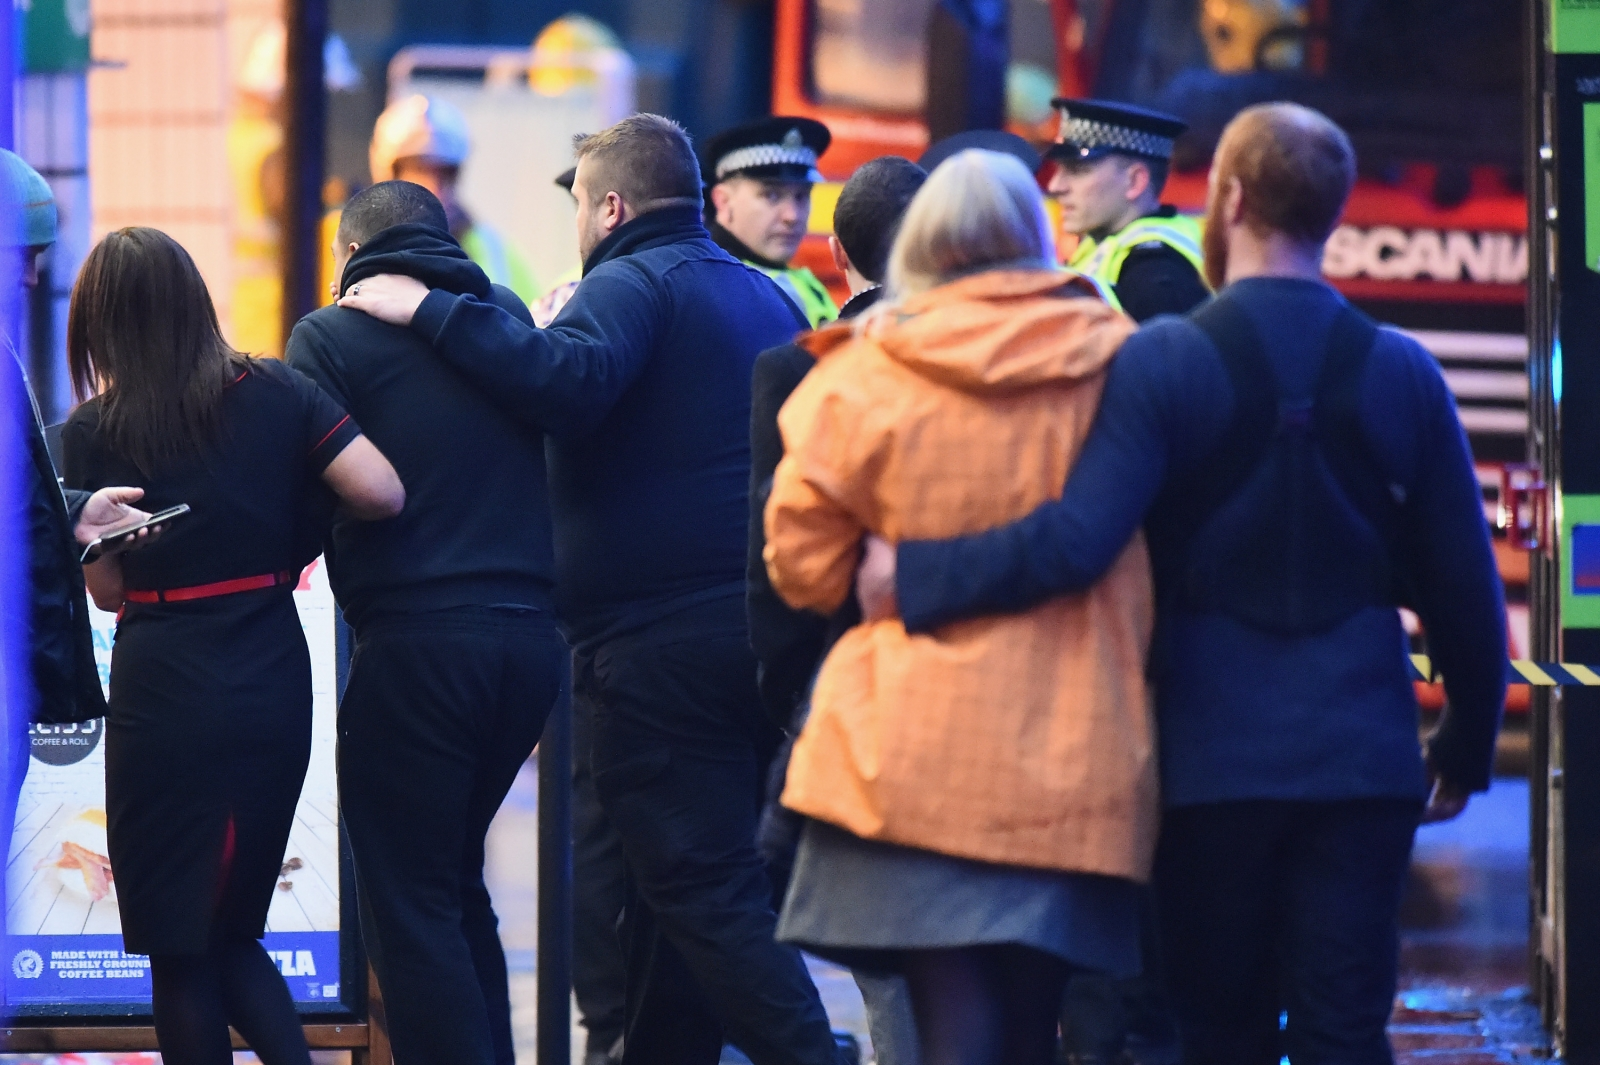 Glasgow lorry crash witness describes scene